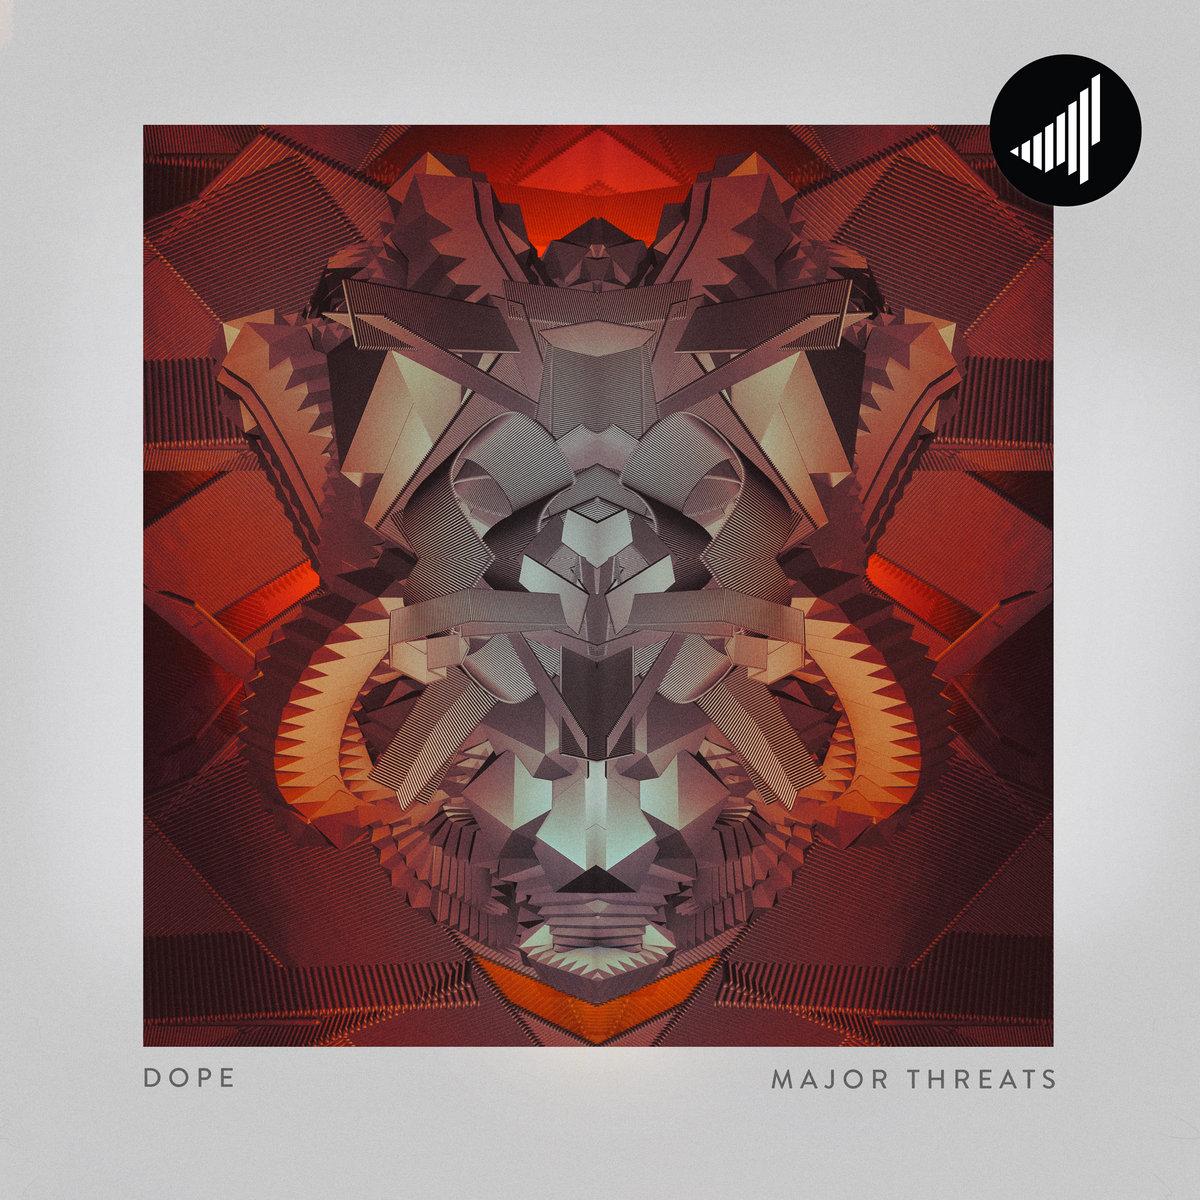 dope – Major Threats